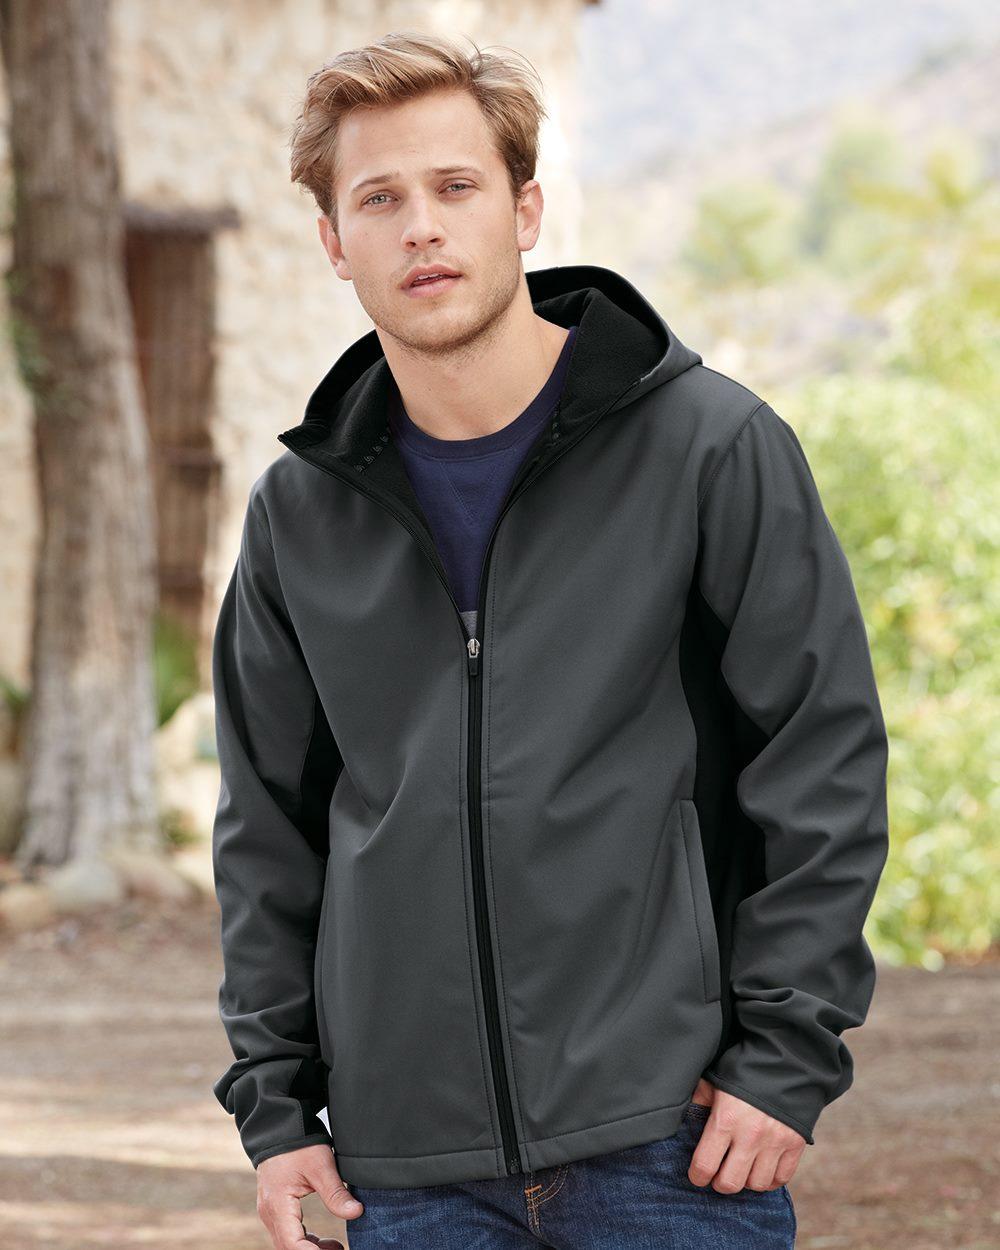 Colorado Clothing 9612 - Hooded Soft Shell Jacket